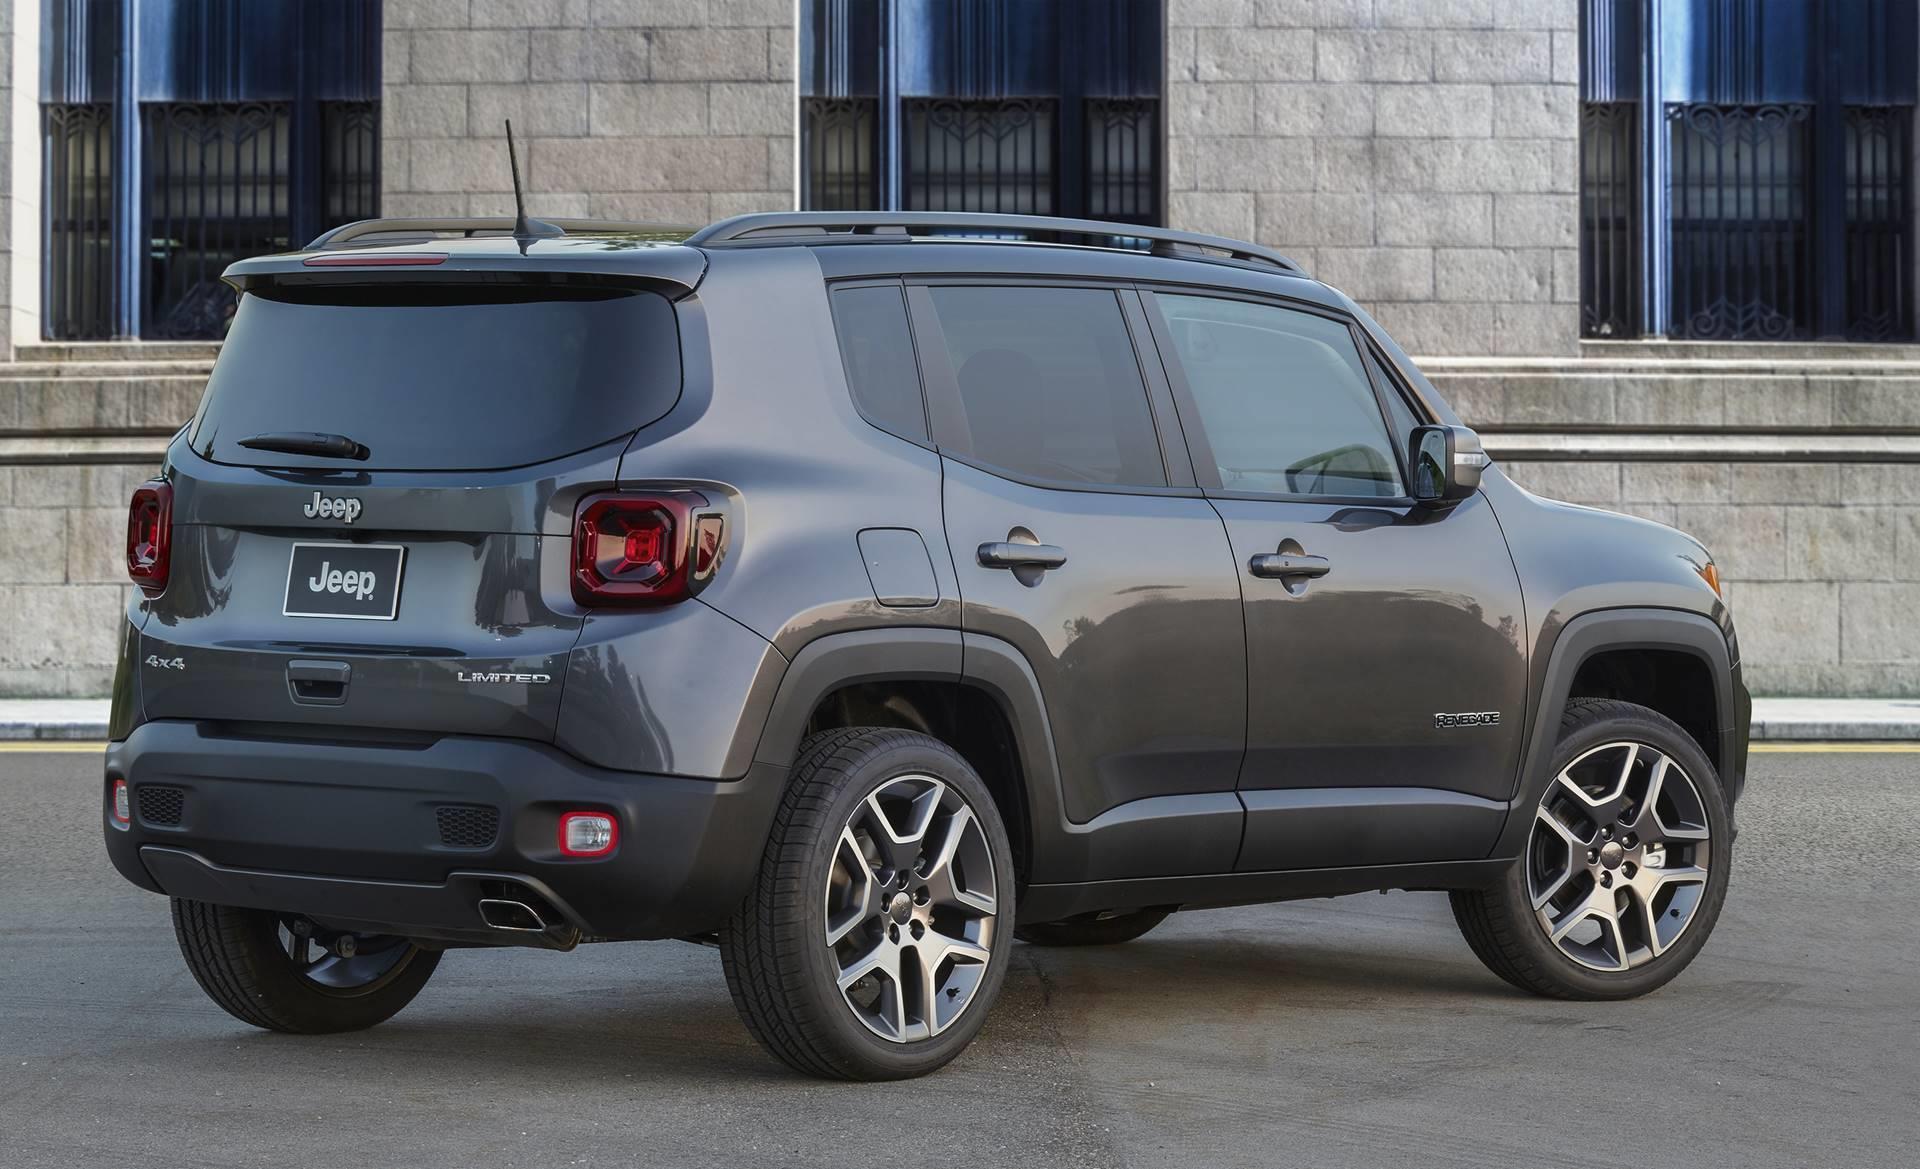 2020 Jeep Renegade News And Information Conceptcarz Com